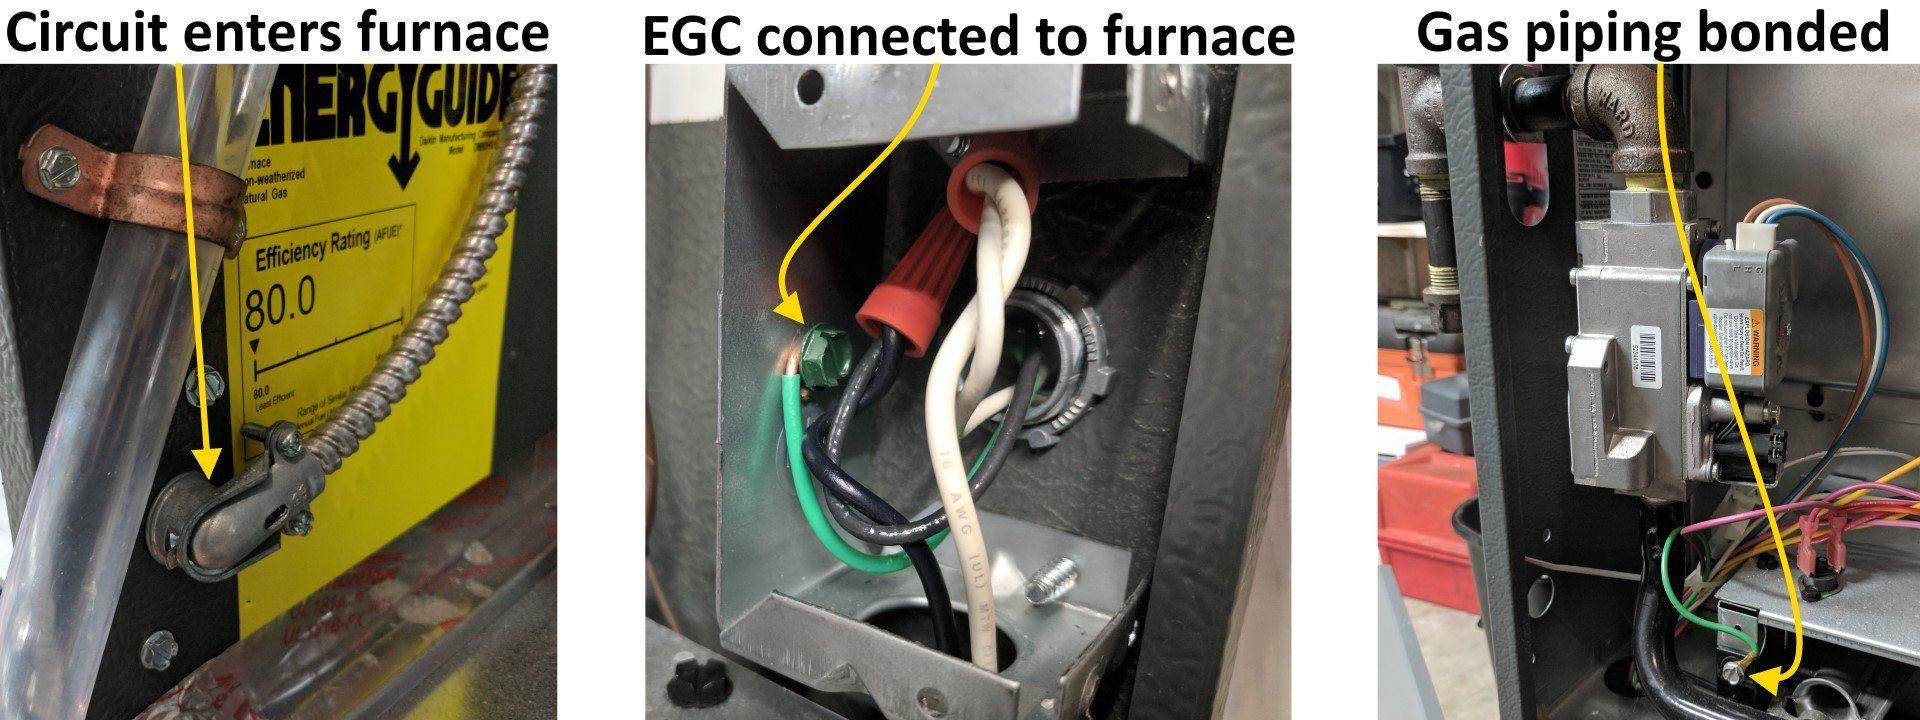 Gas piping bonded at furnace